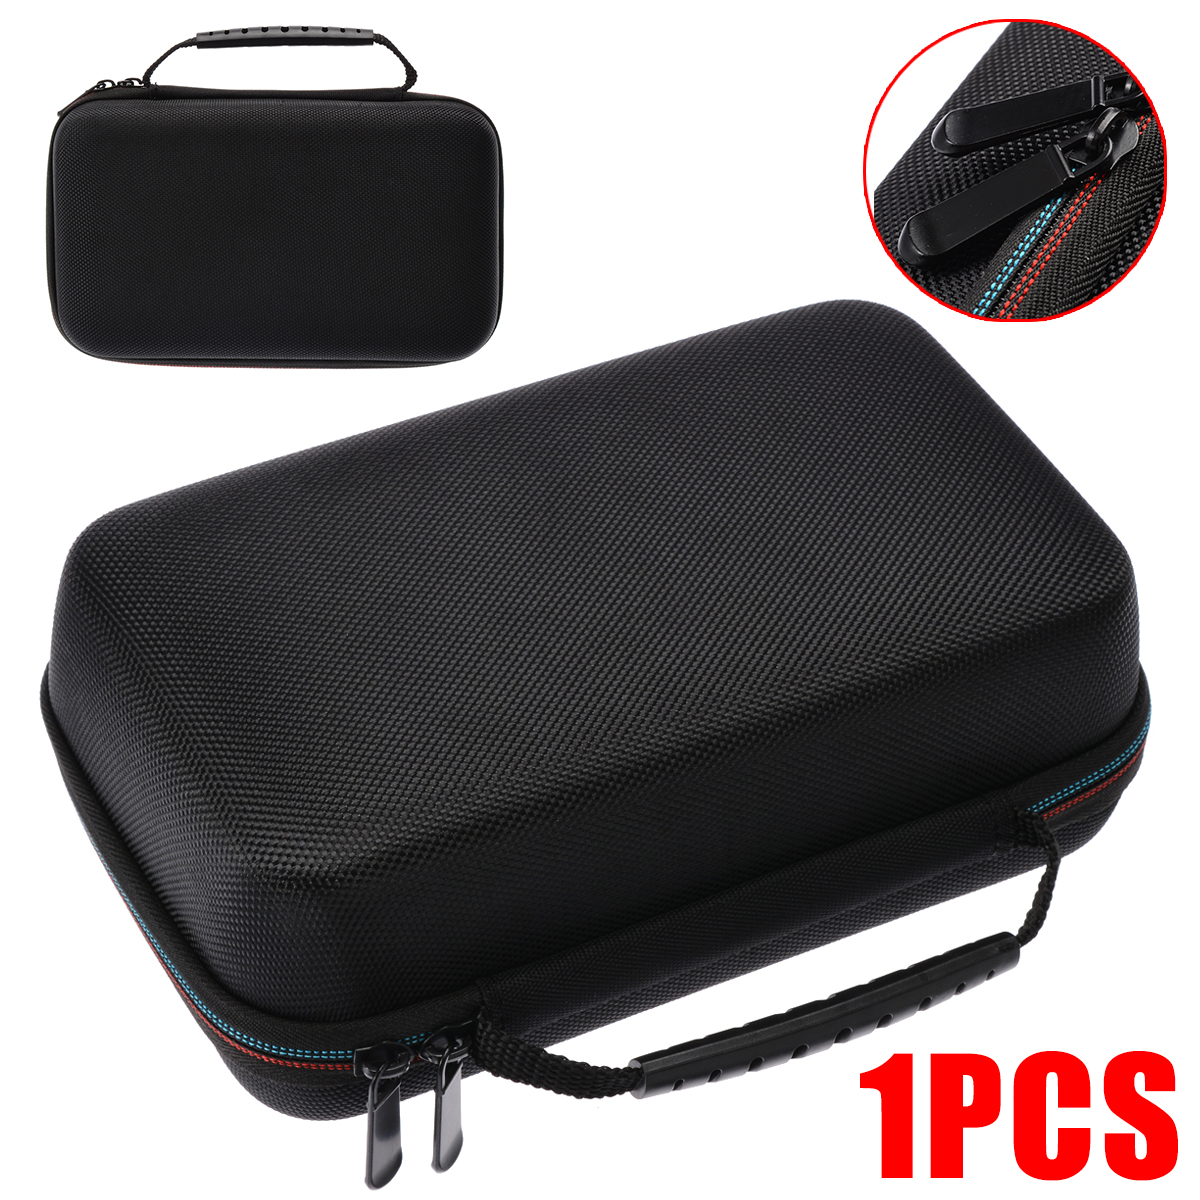 Portable EVA Tester Multimeters Storage Bag Carry Case For F117C/ F17B Digital Multimeter